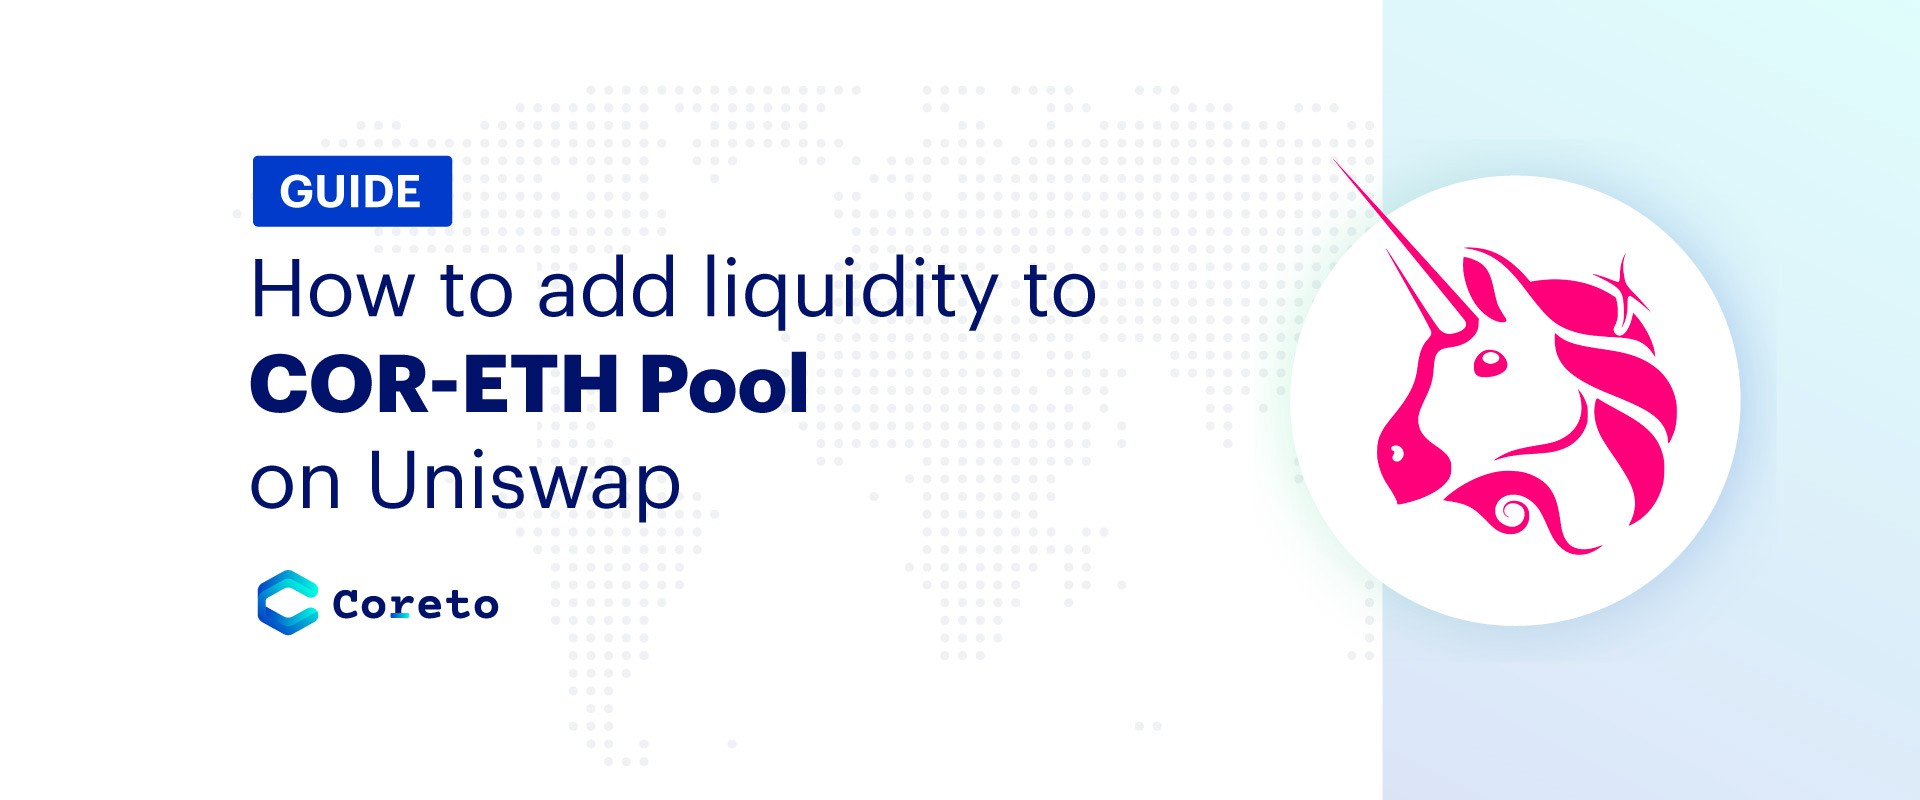 How to add liquidity to Uniswap Guide